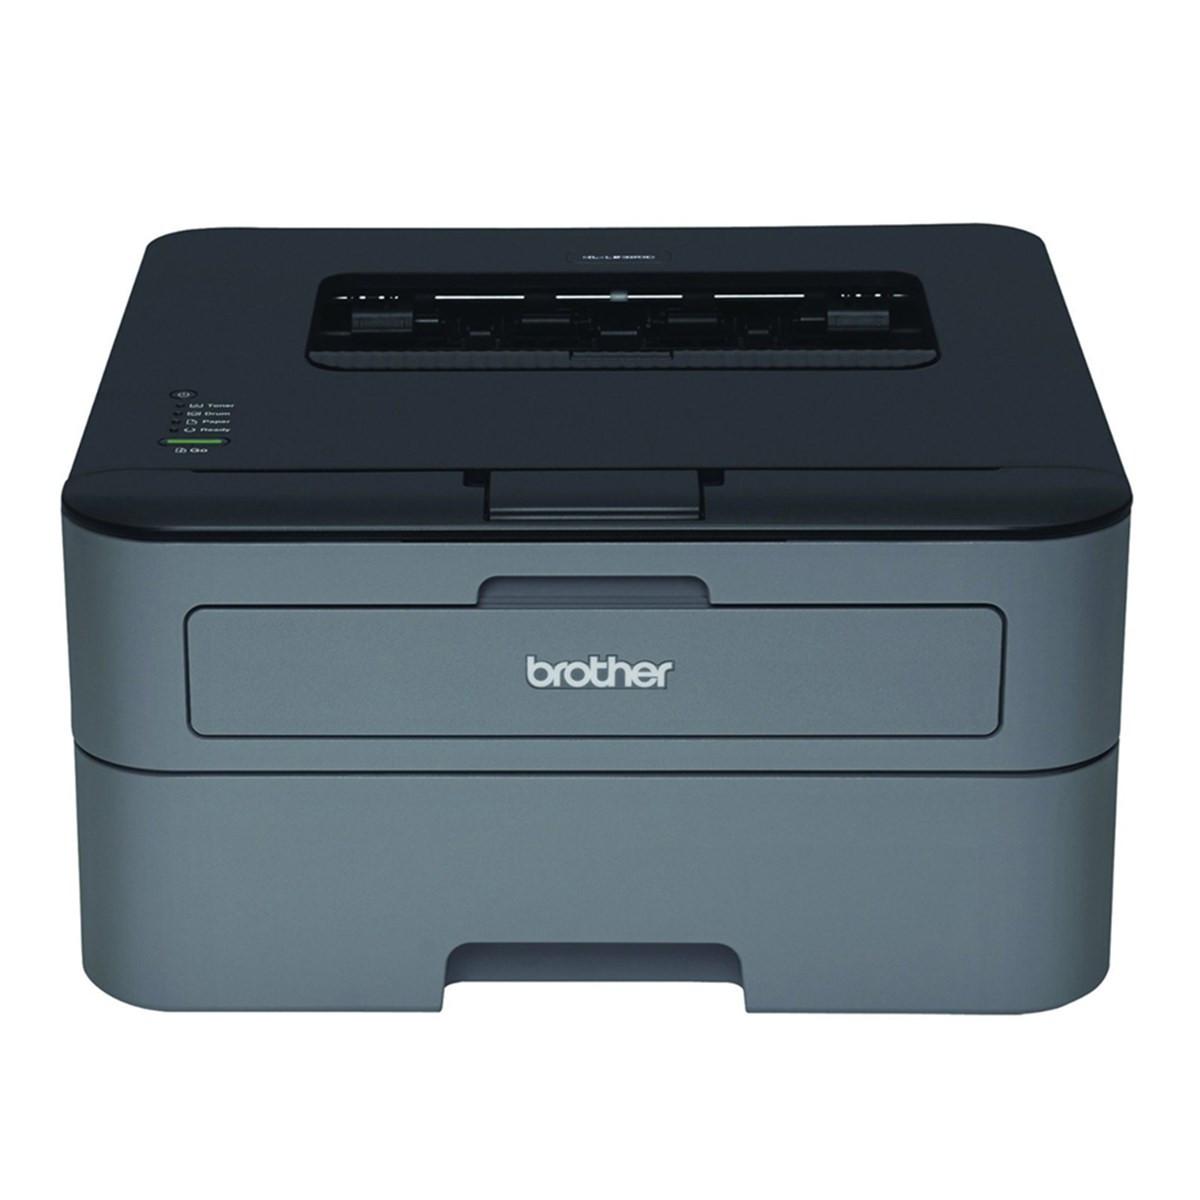 Impressora Brother HL-L2320D HLL2320 Laser Monocromática com Duplex